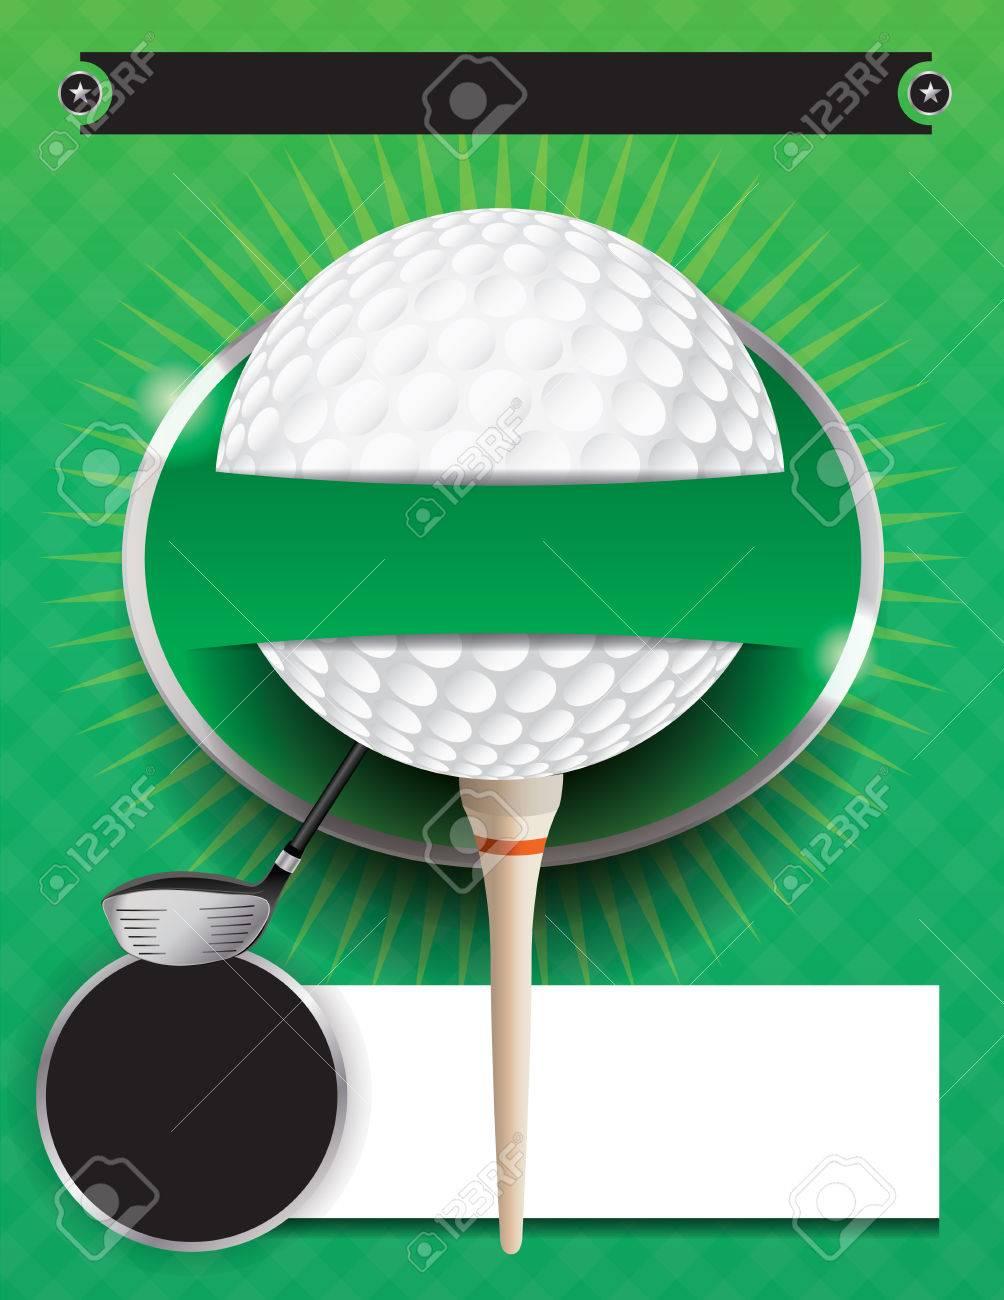 An illustration for a golf tournament. - 49867497